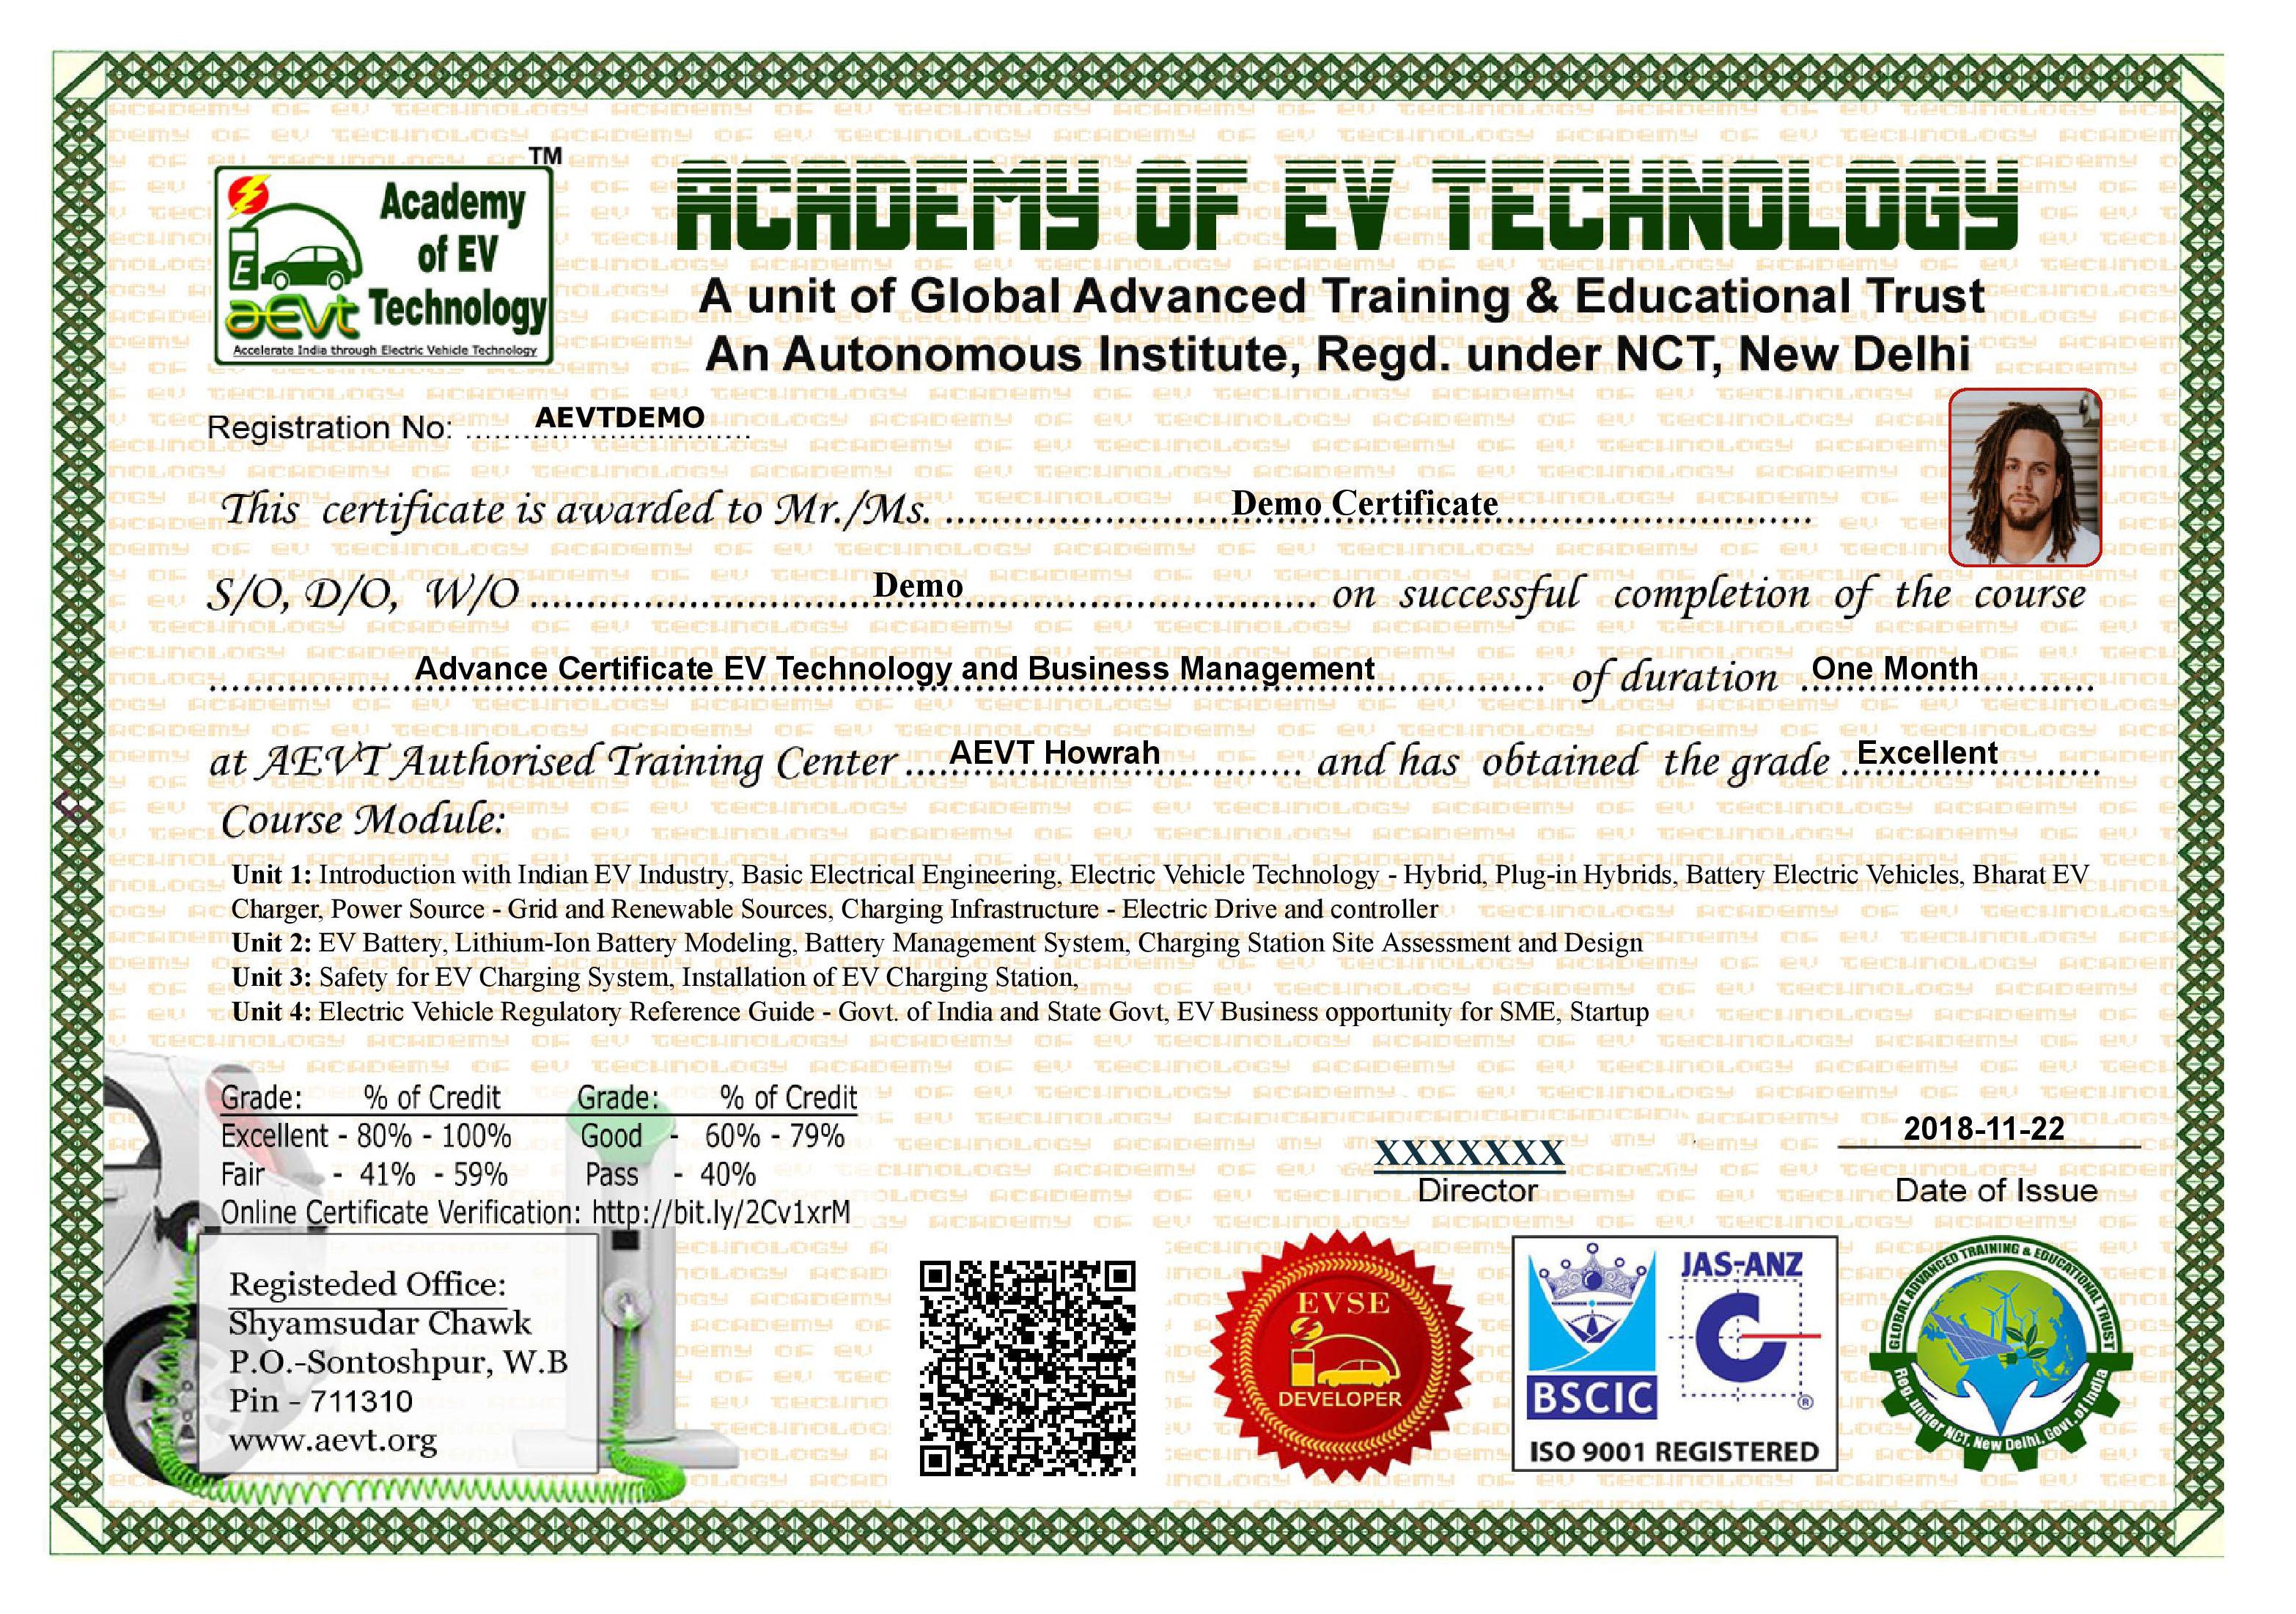 Demo Certificate